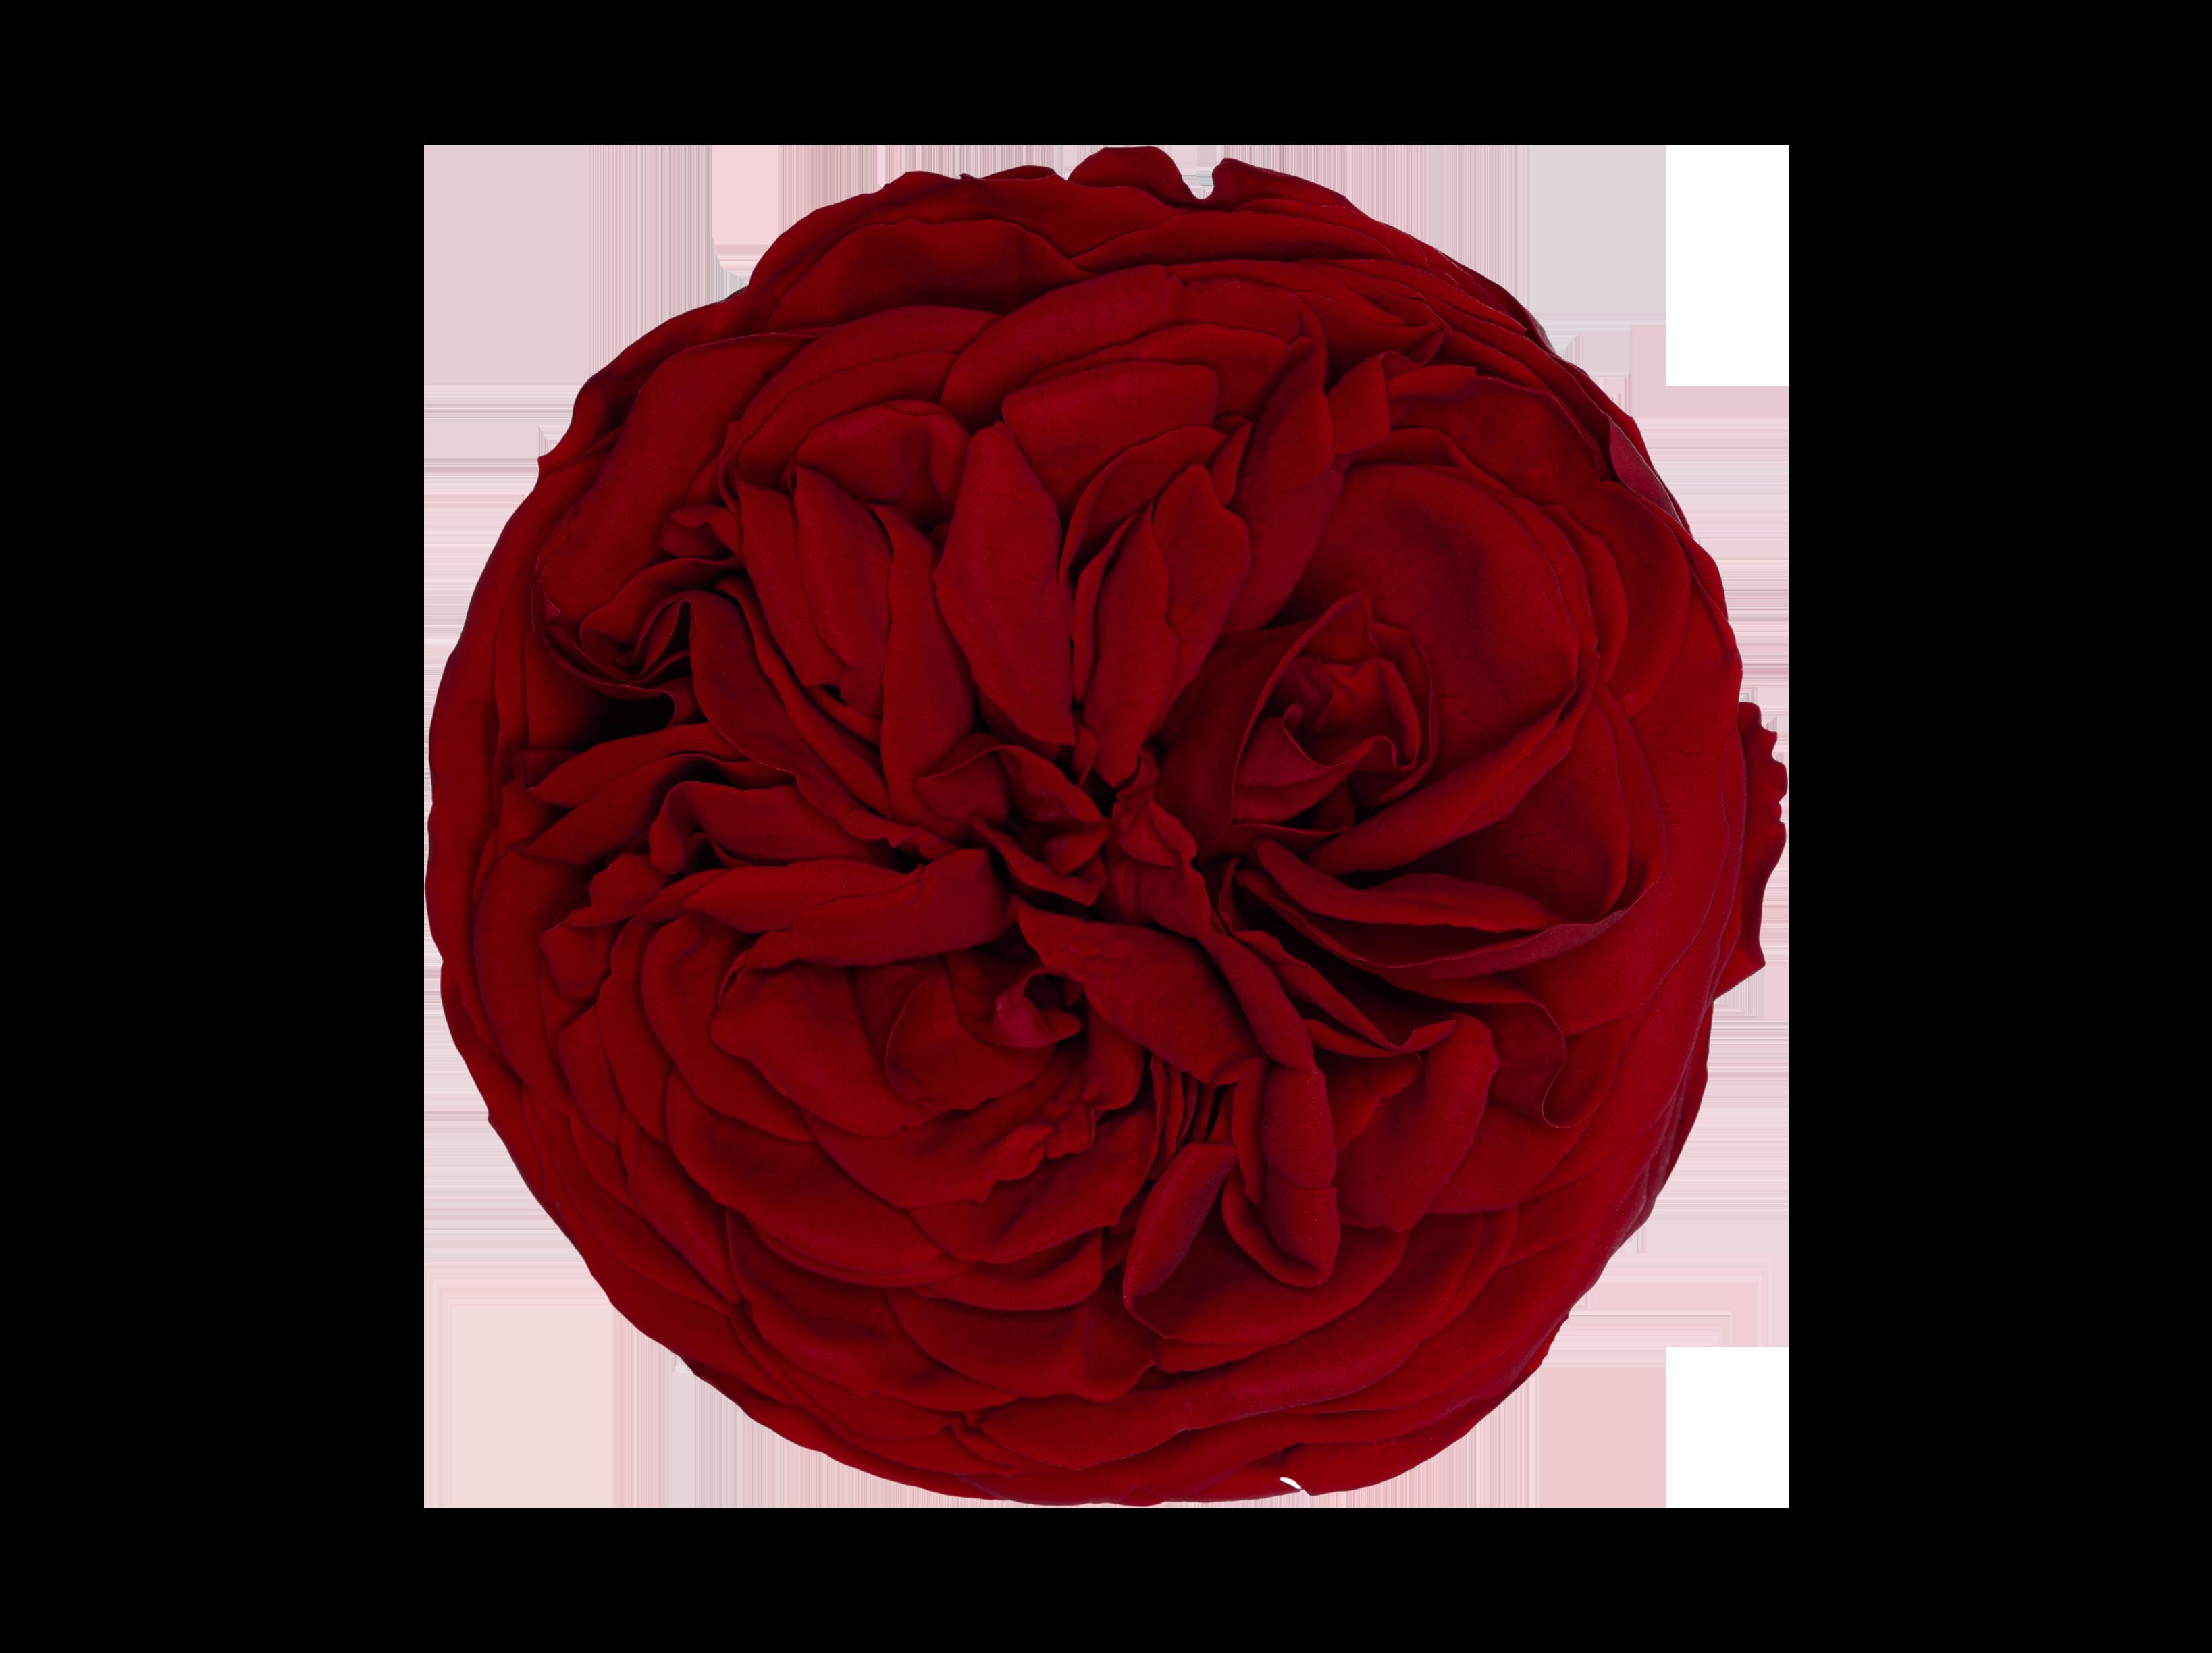 kabukyza-Red-02-Frontal